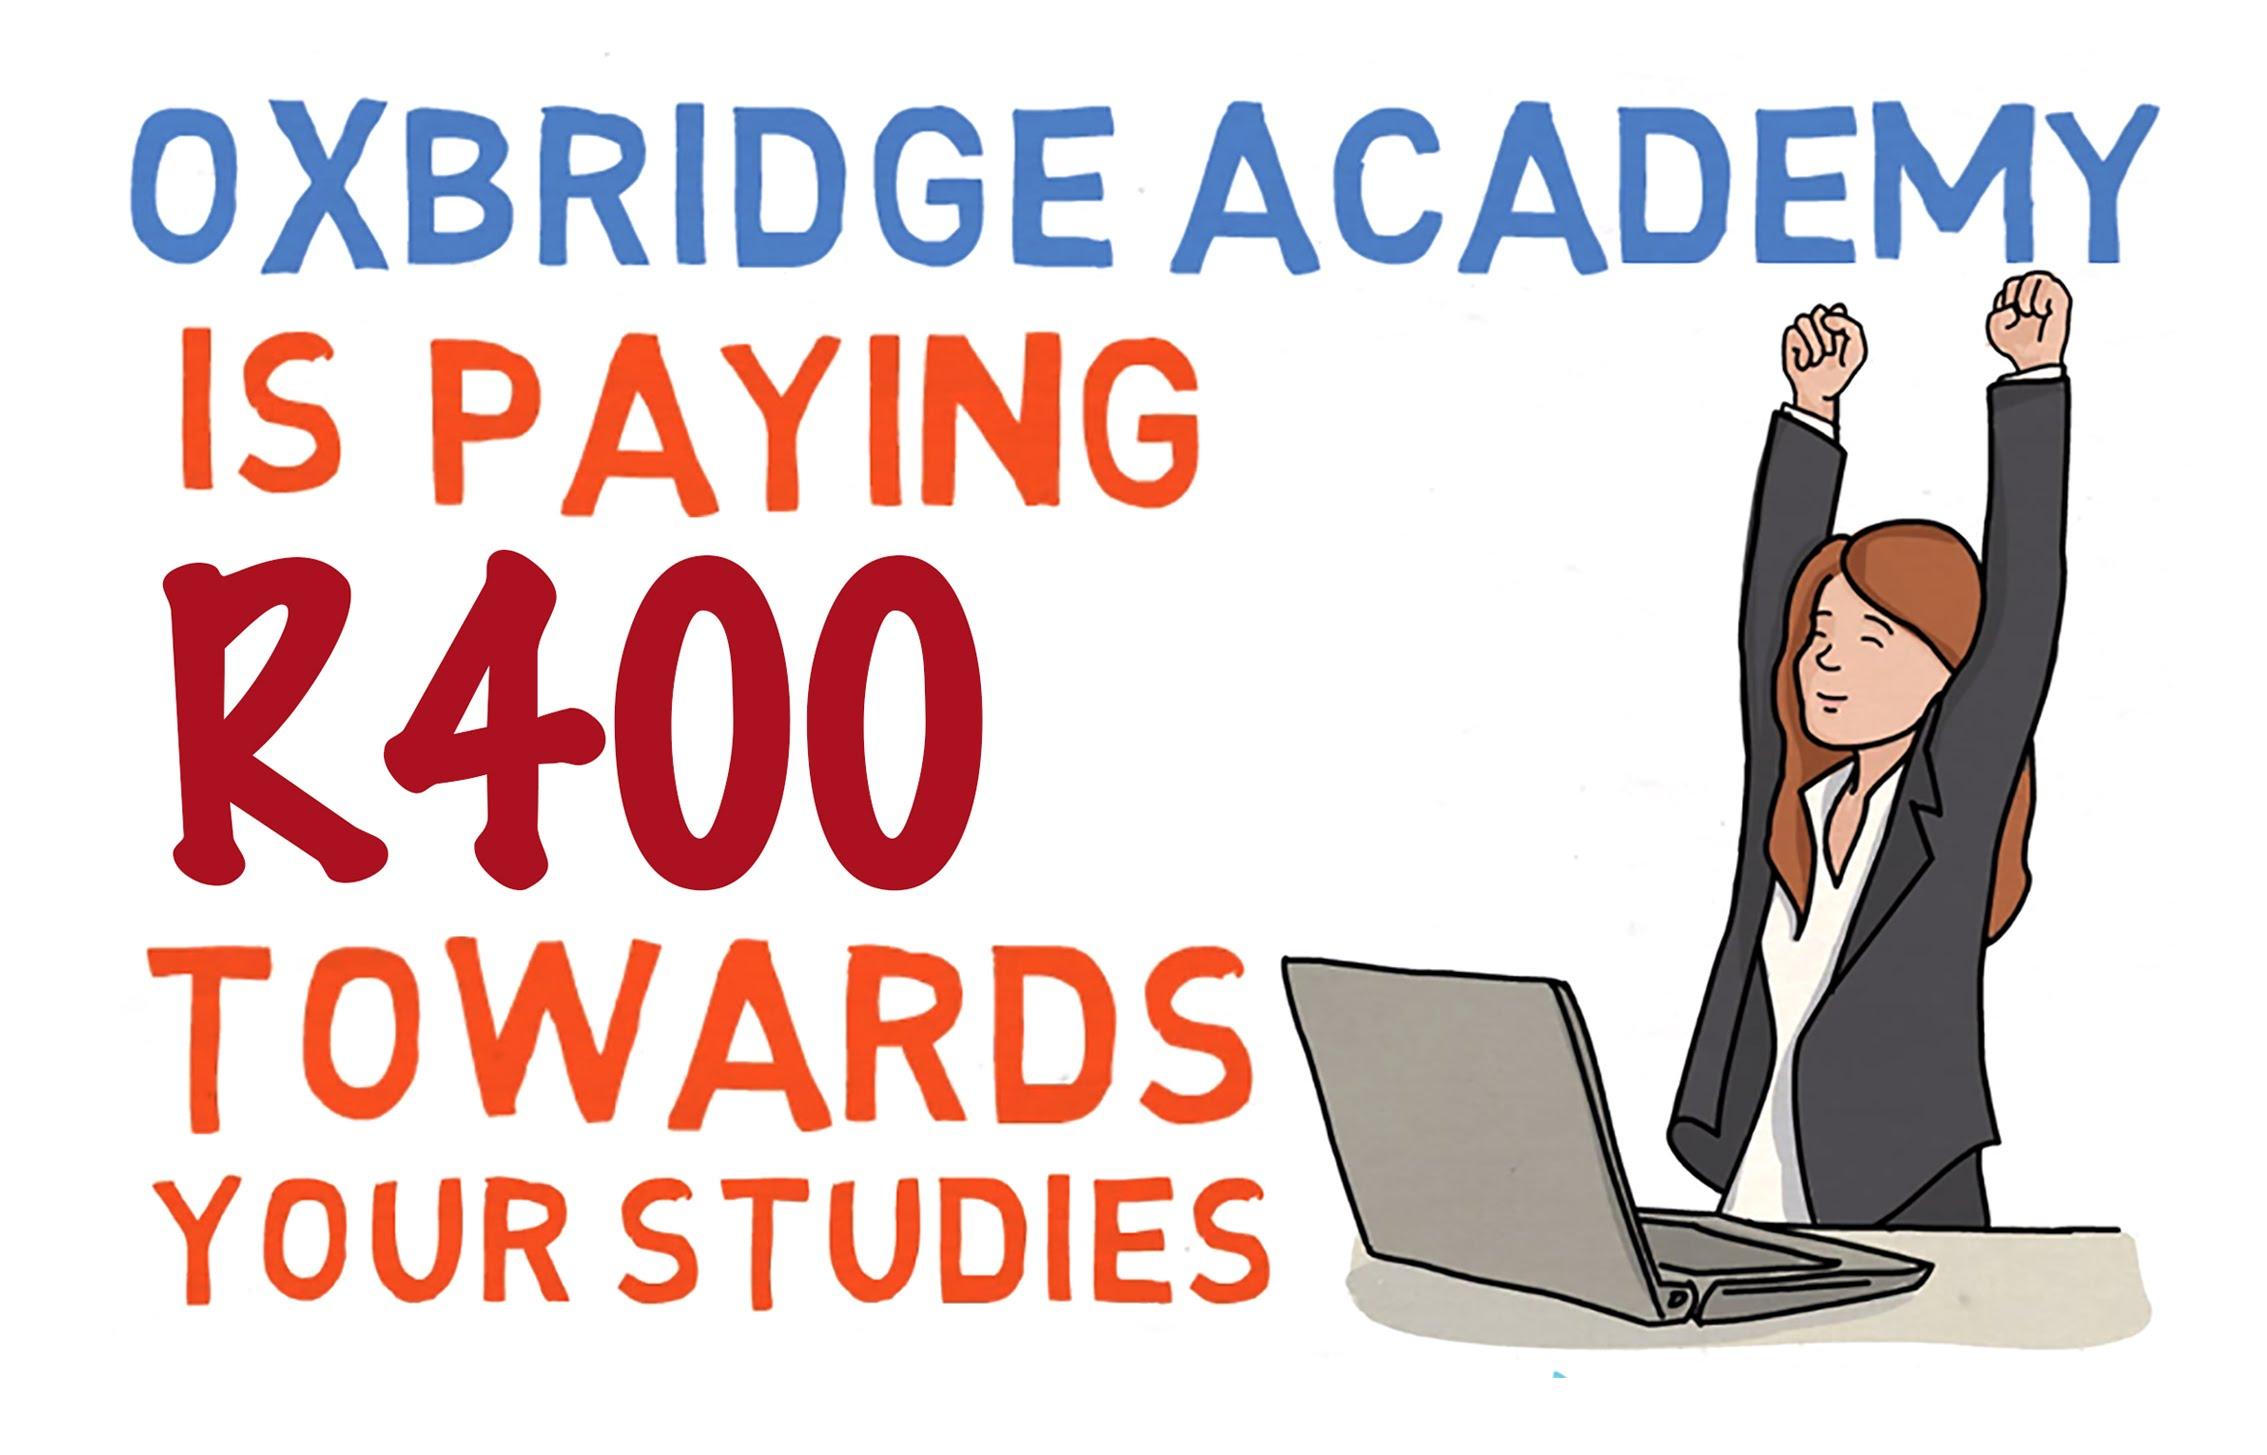 Get Your R400 Oxbridge Academy Voucher.